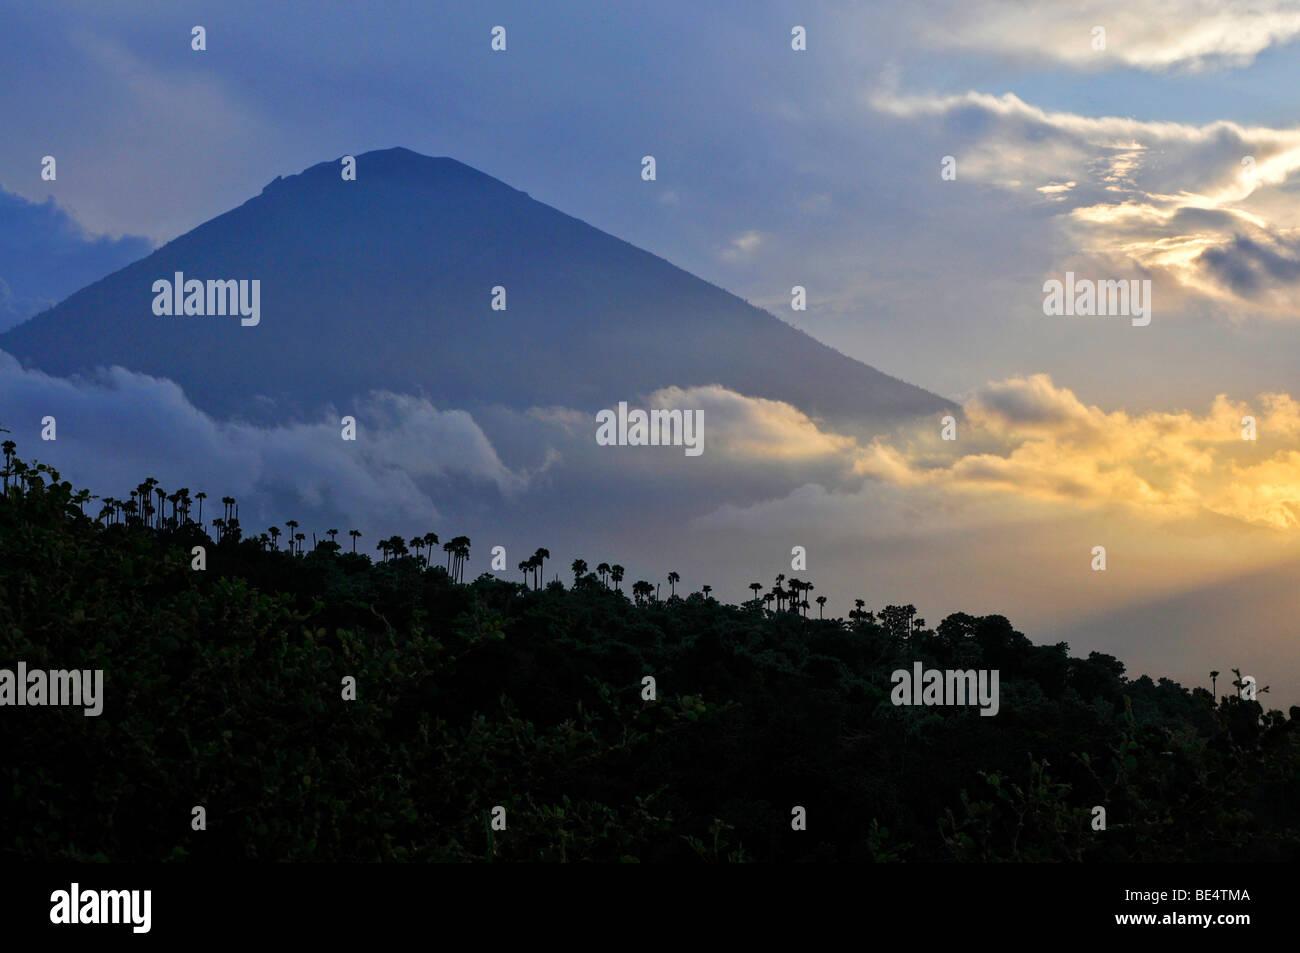 Sonnenuntergang mit dem Vulkan Gunung Agung in Amed, Bali, Indonesien, Südostasien Stockbild